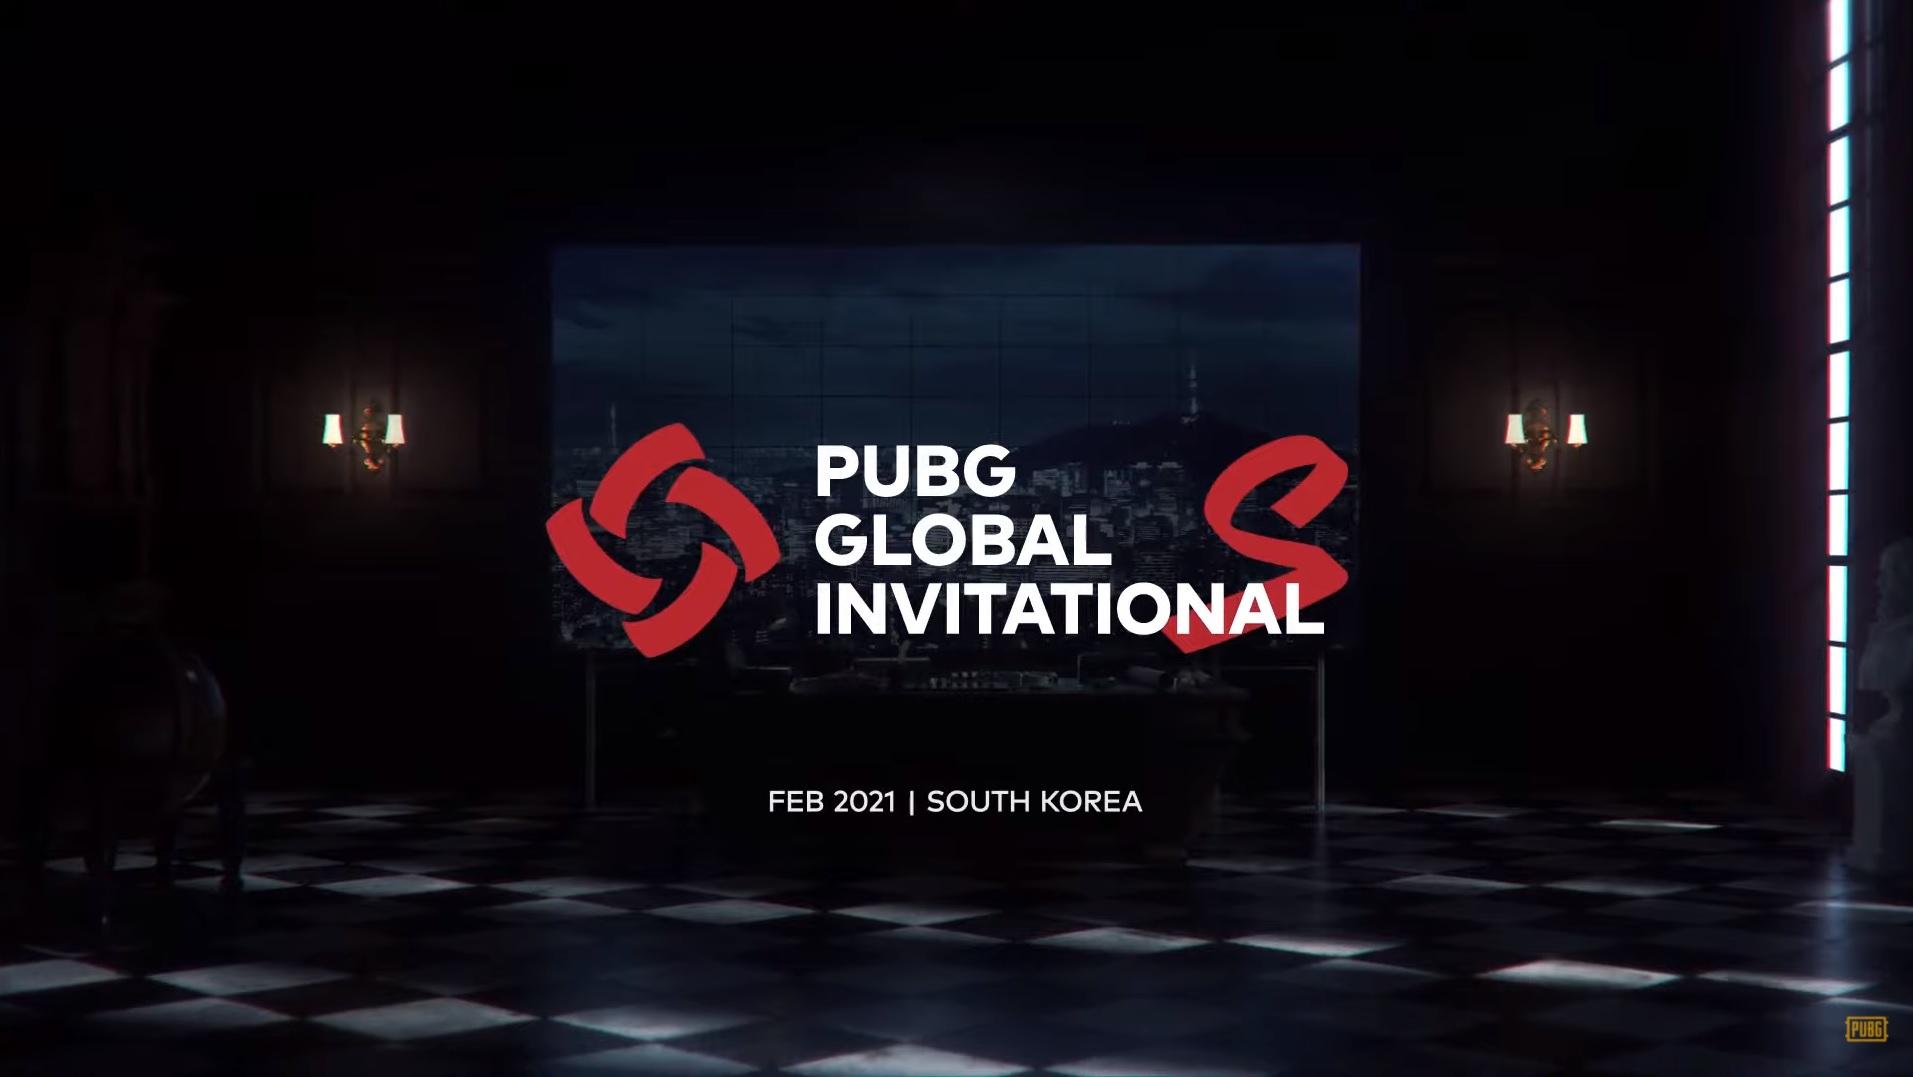 PUBG Global Invitational.S akan berlangsung di Korea Selatan bermula dari Februari 2021